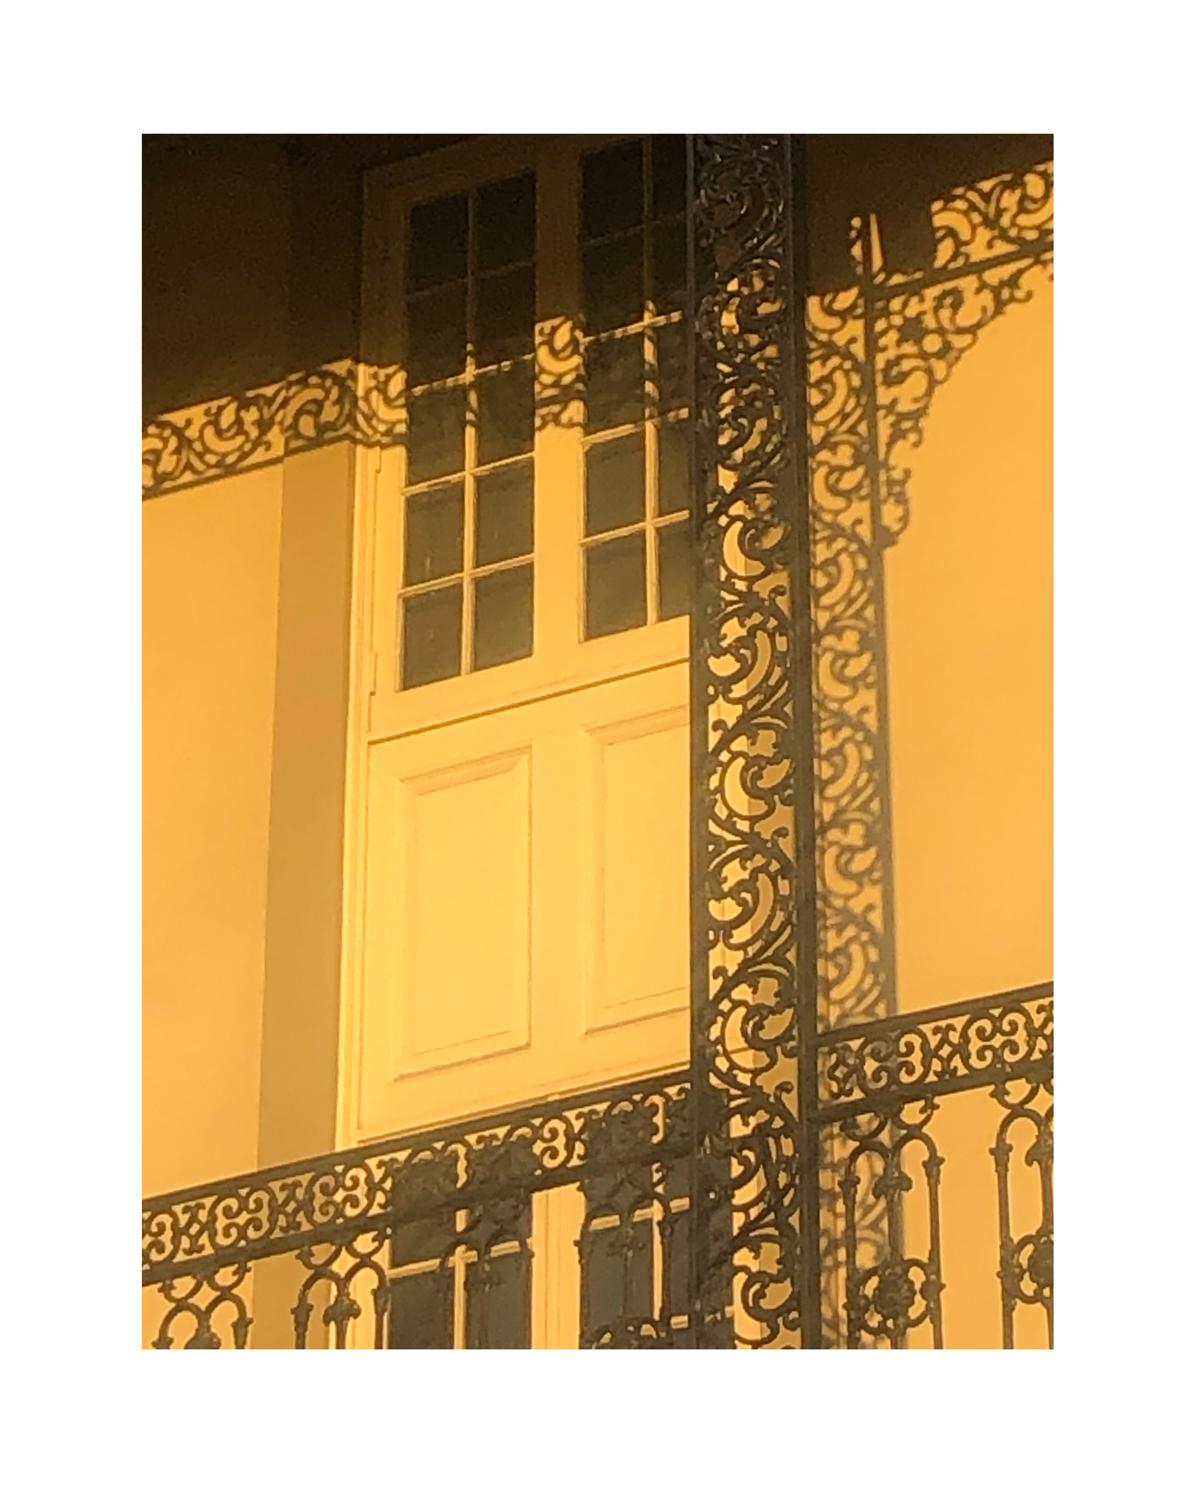 Photo of railings casting unusual shadow by Molly Olwig